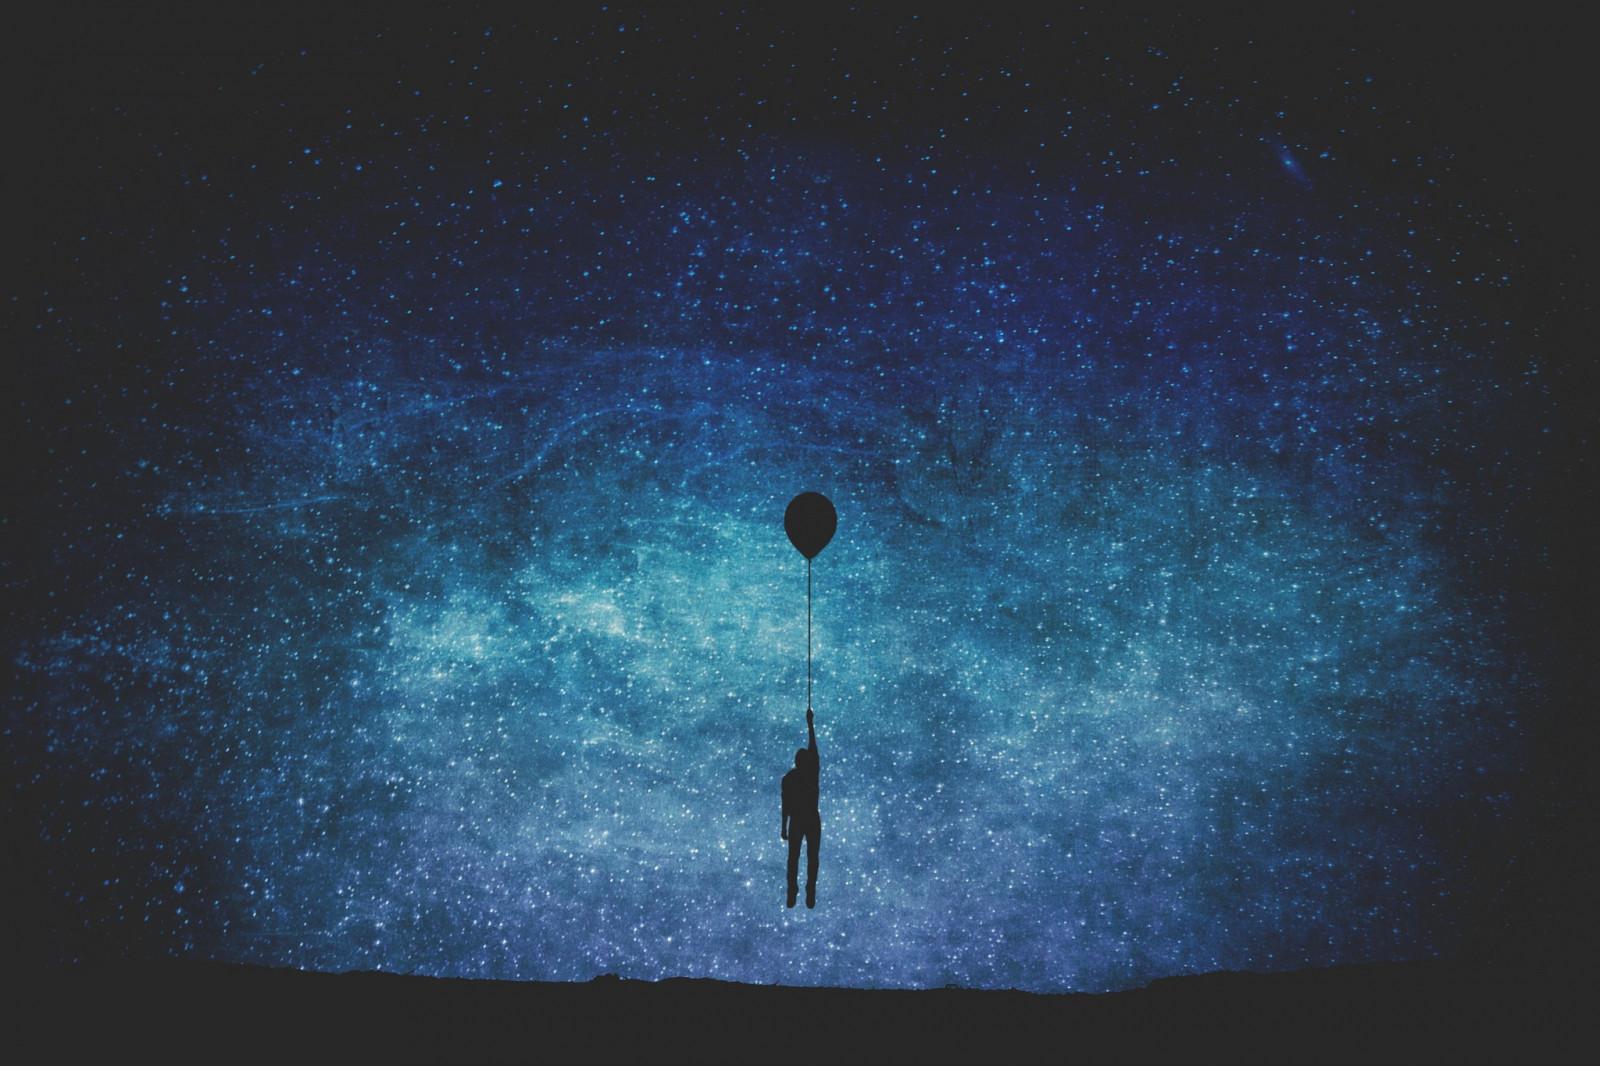 Wallpaper : night, galaxy, minimalism, sky, moonlight ...